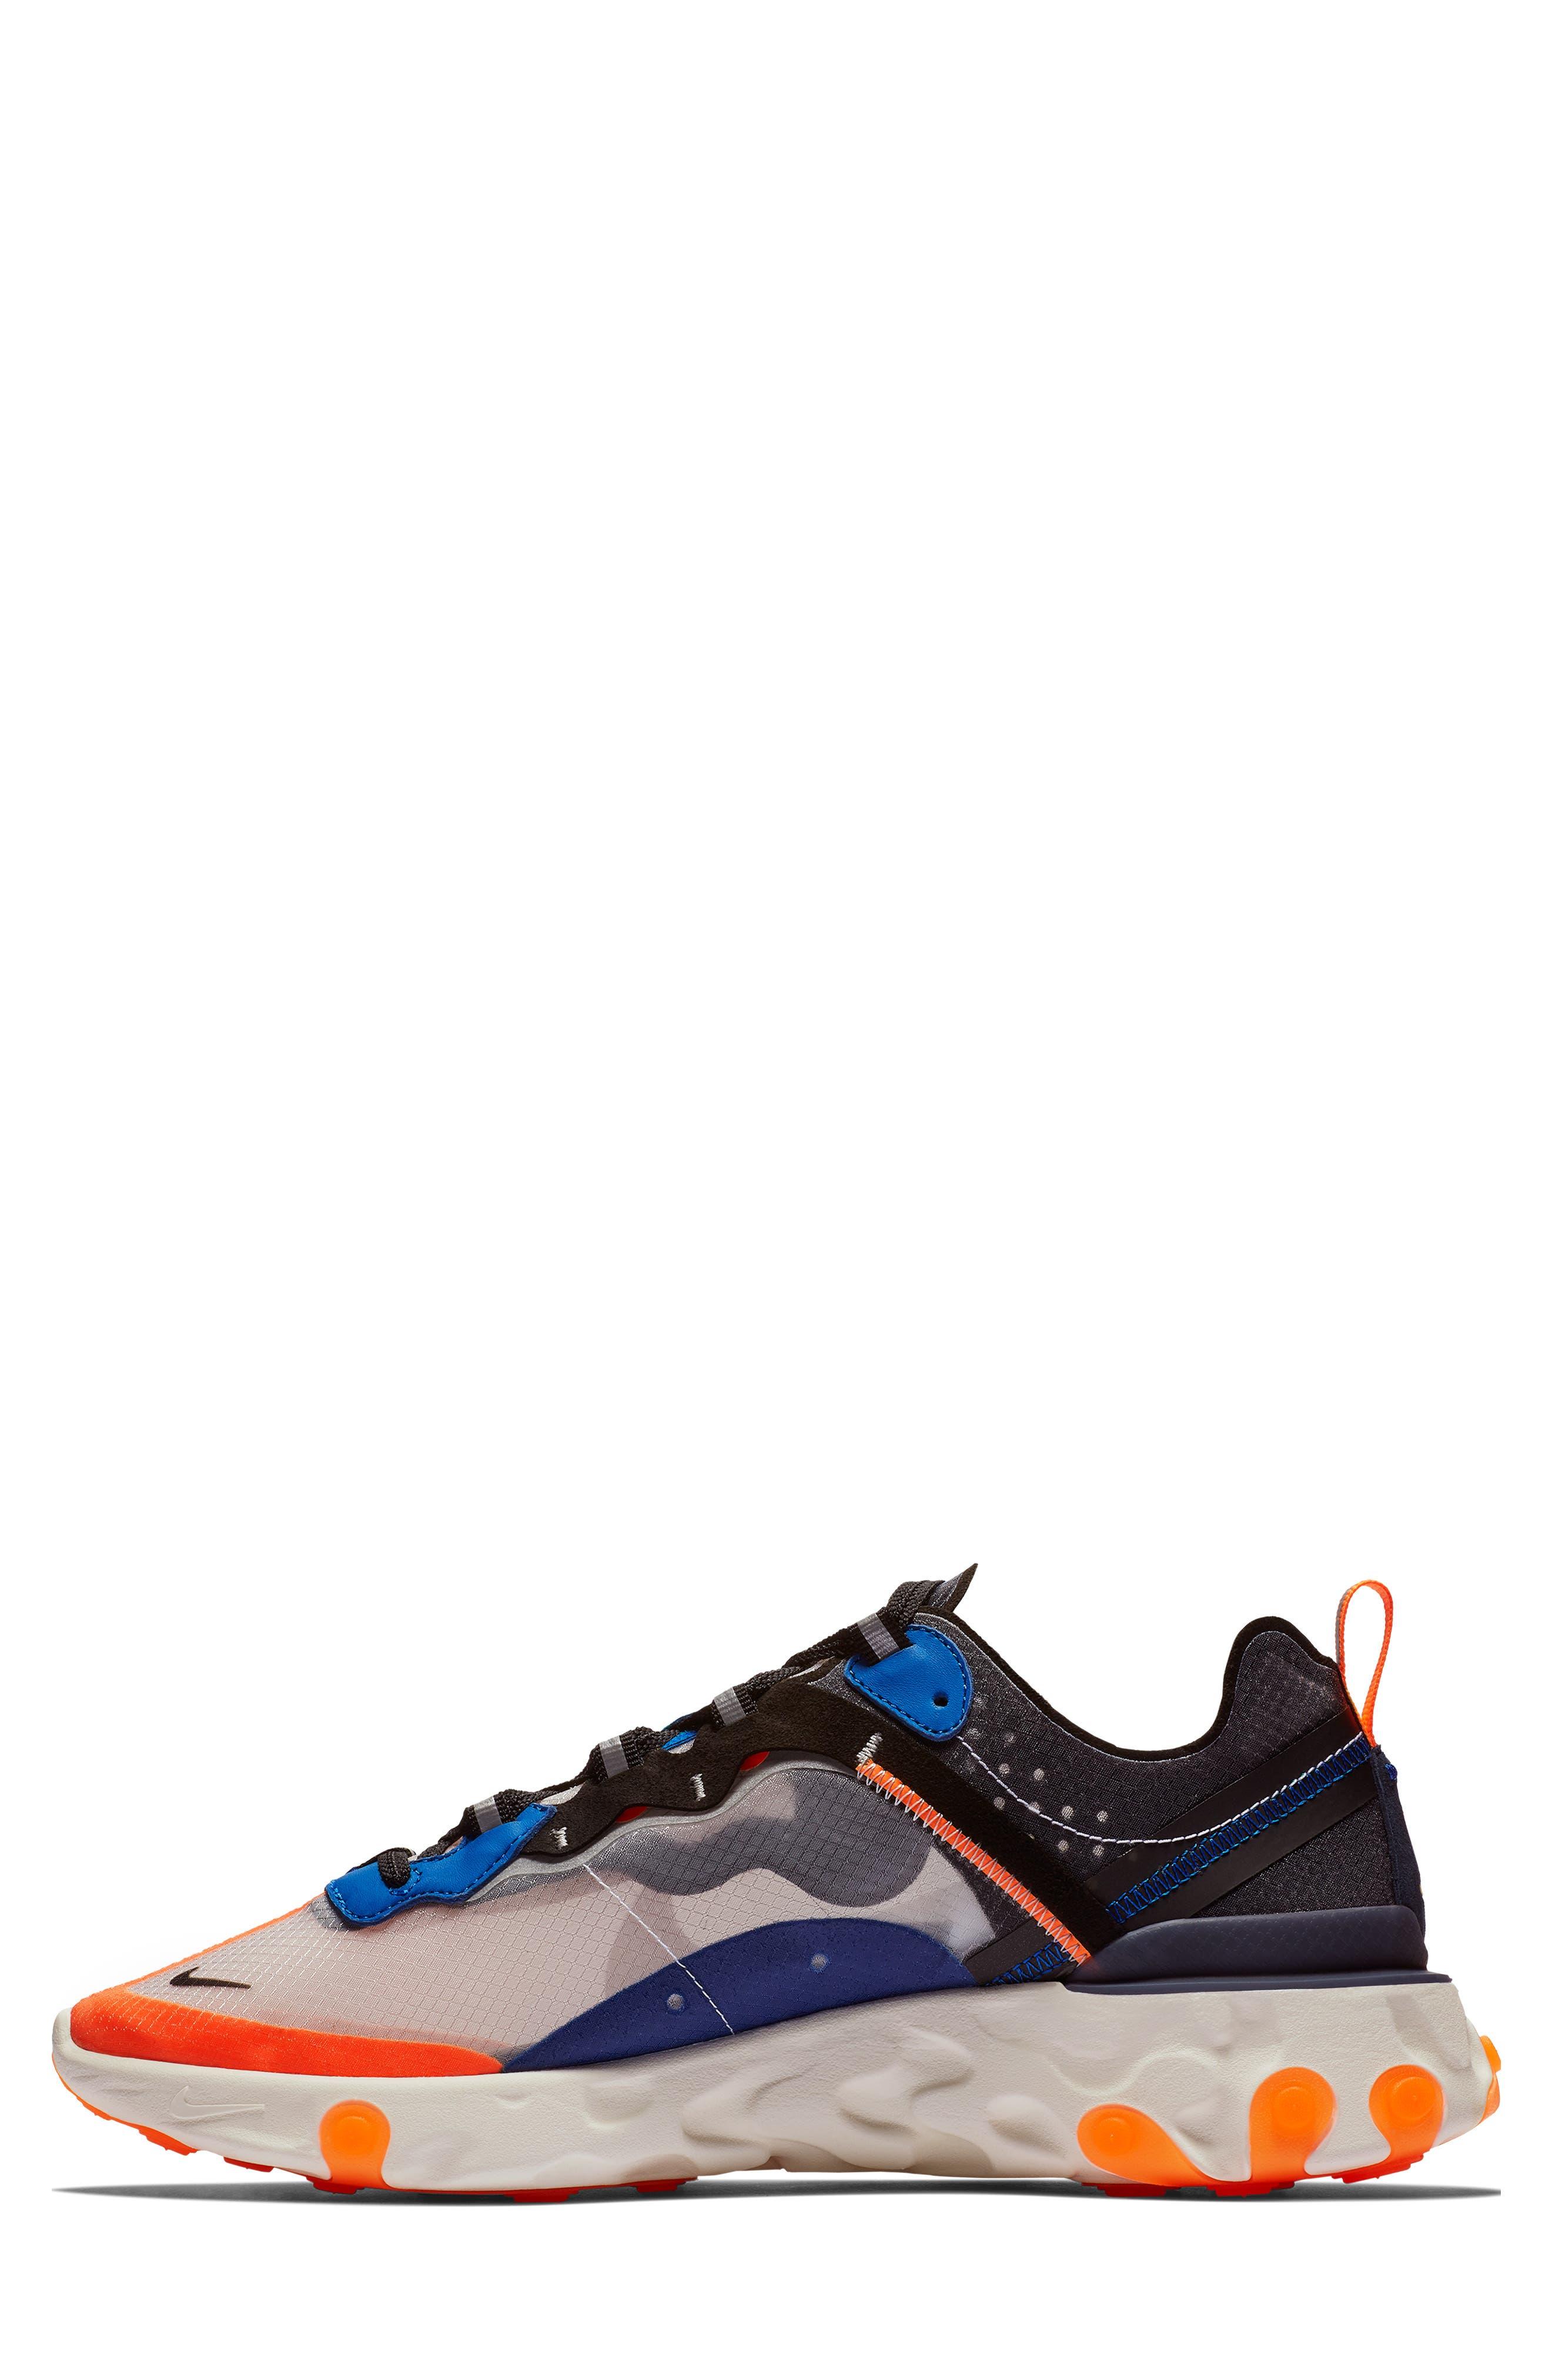 React Element 87 Sneaker,                             Alternate thumbnail 3, color,                             021